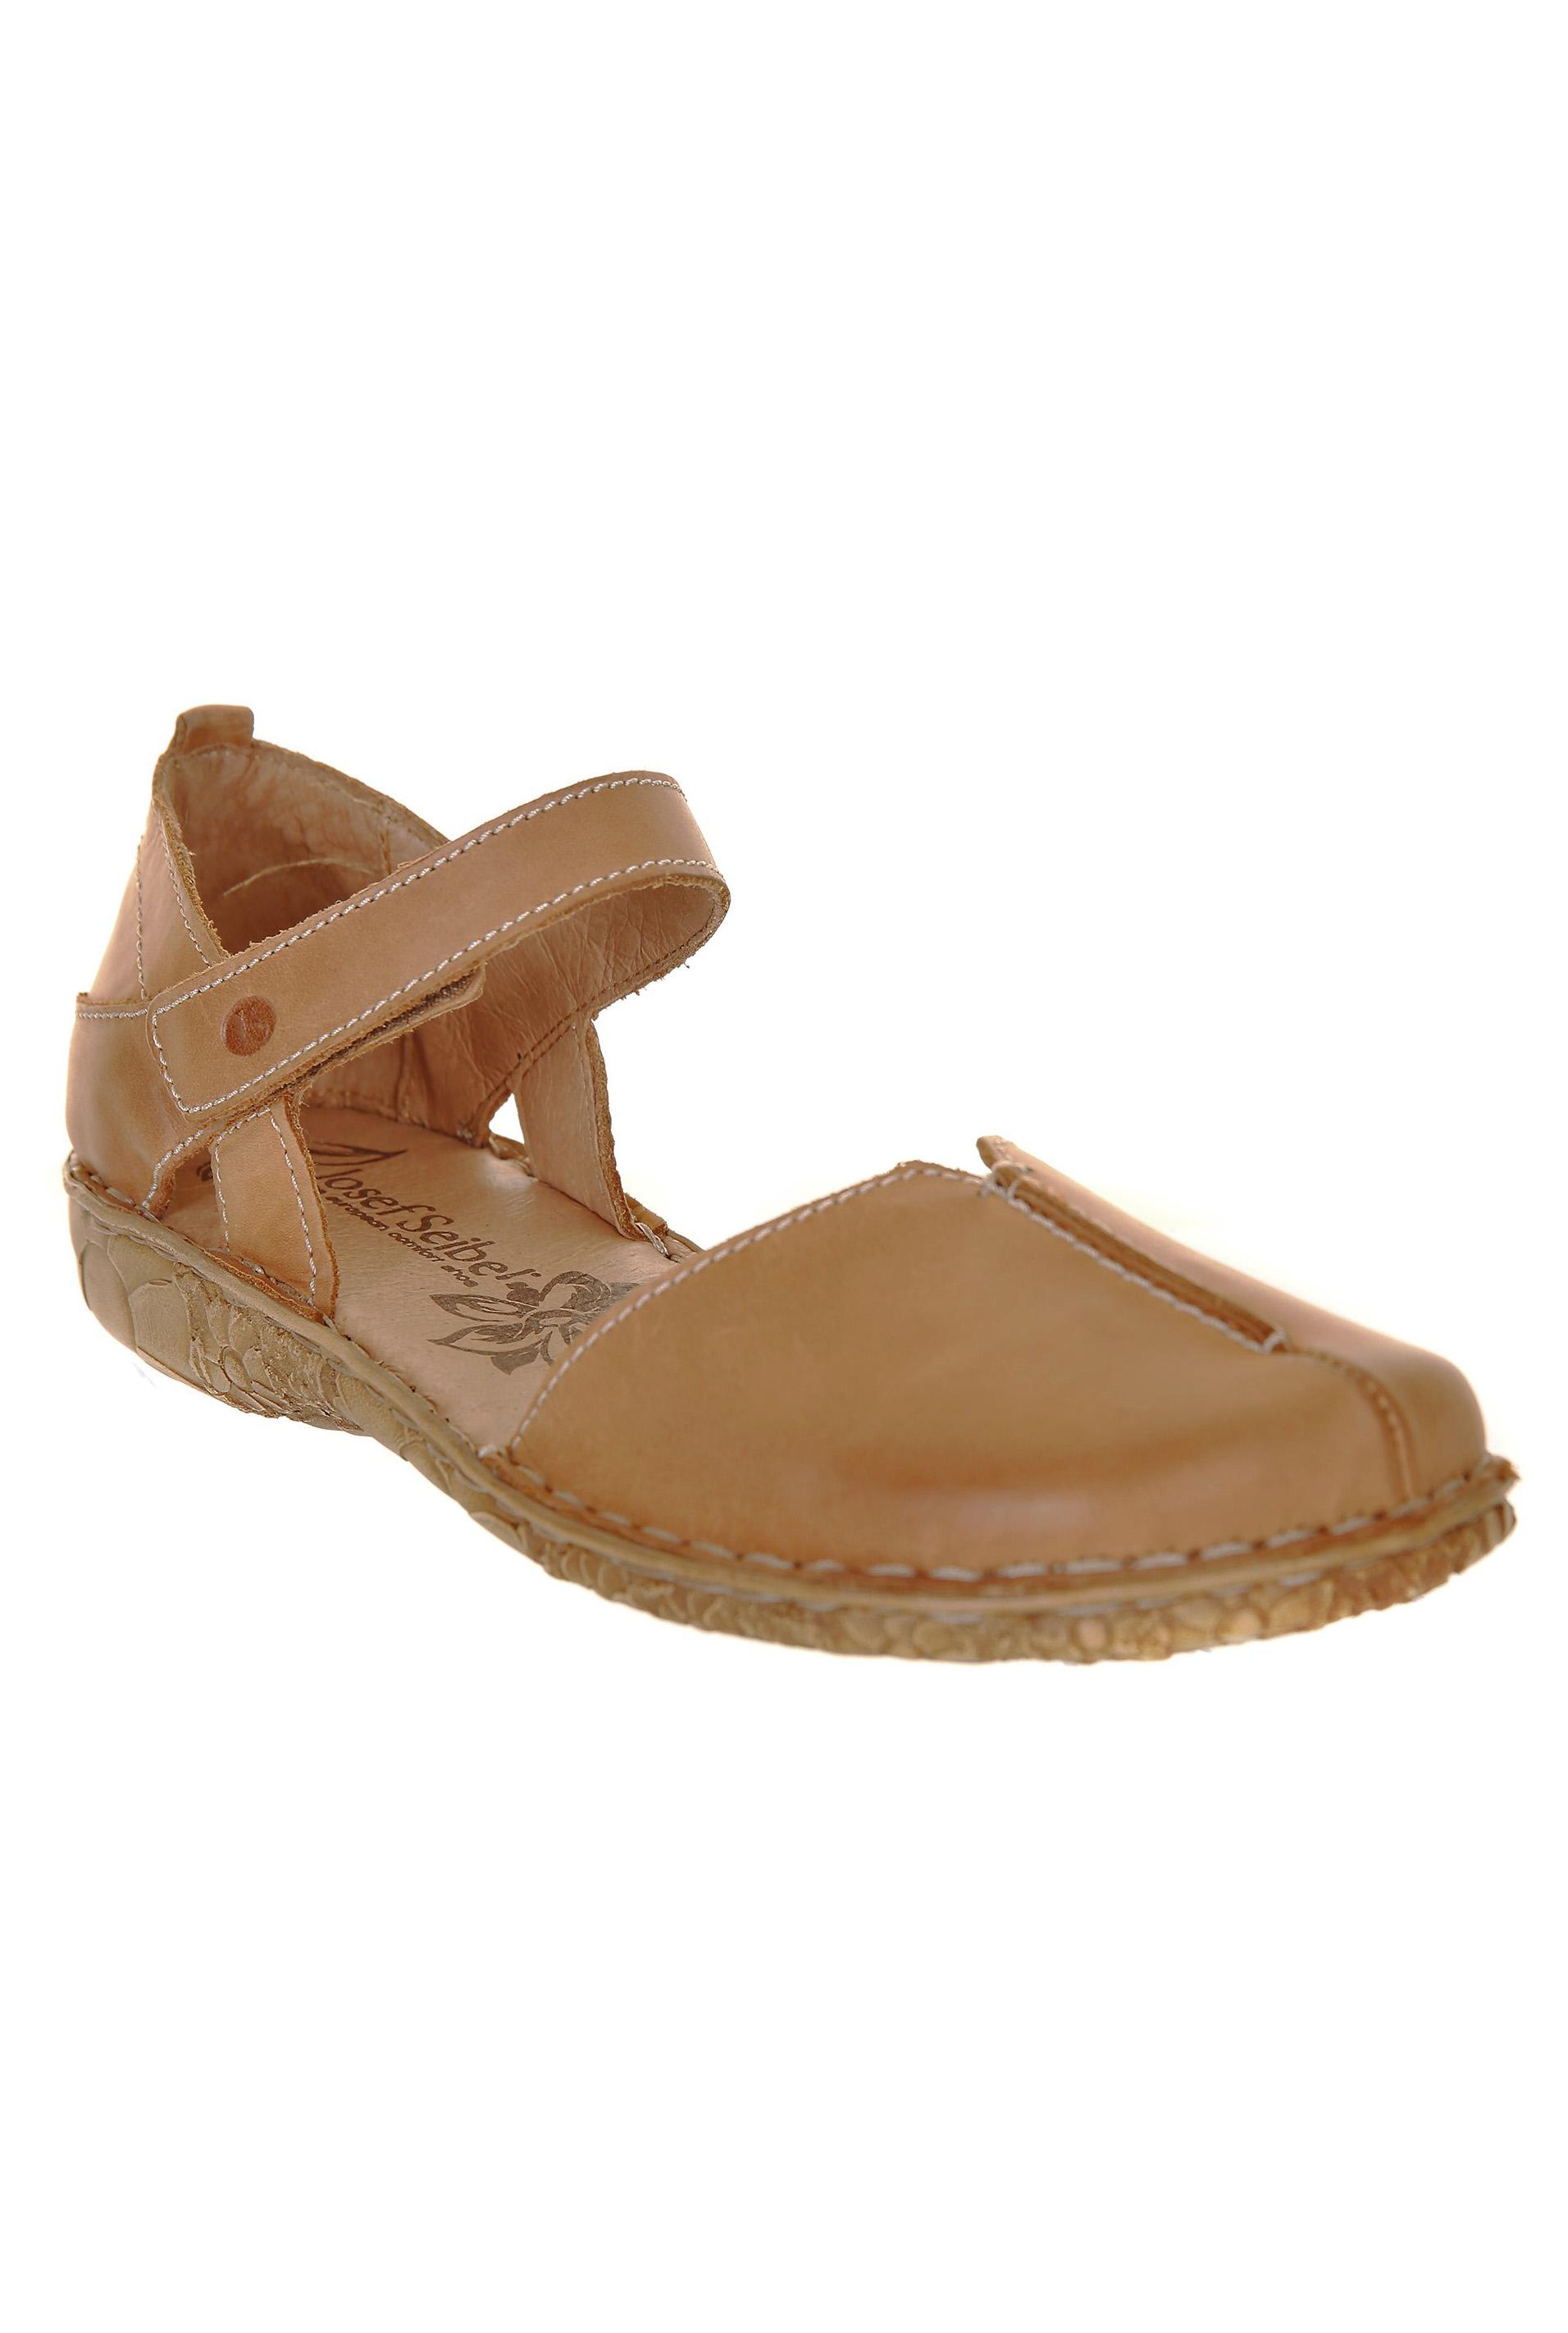 Josef Seibel Rosalie 42 Leather Shoe